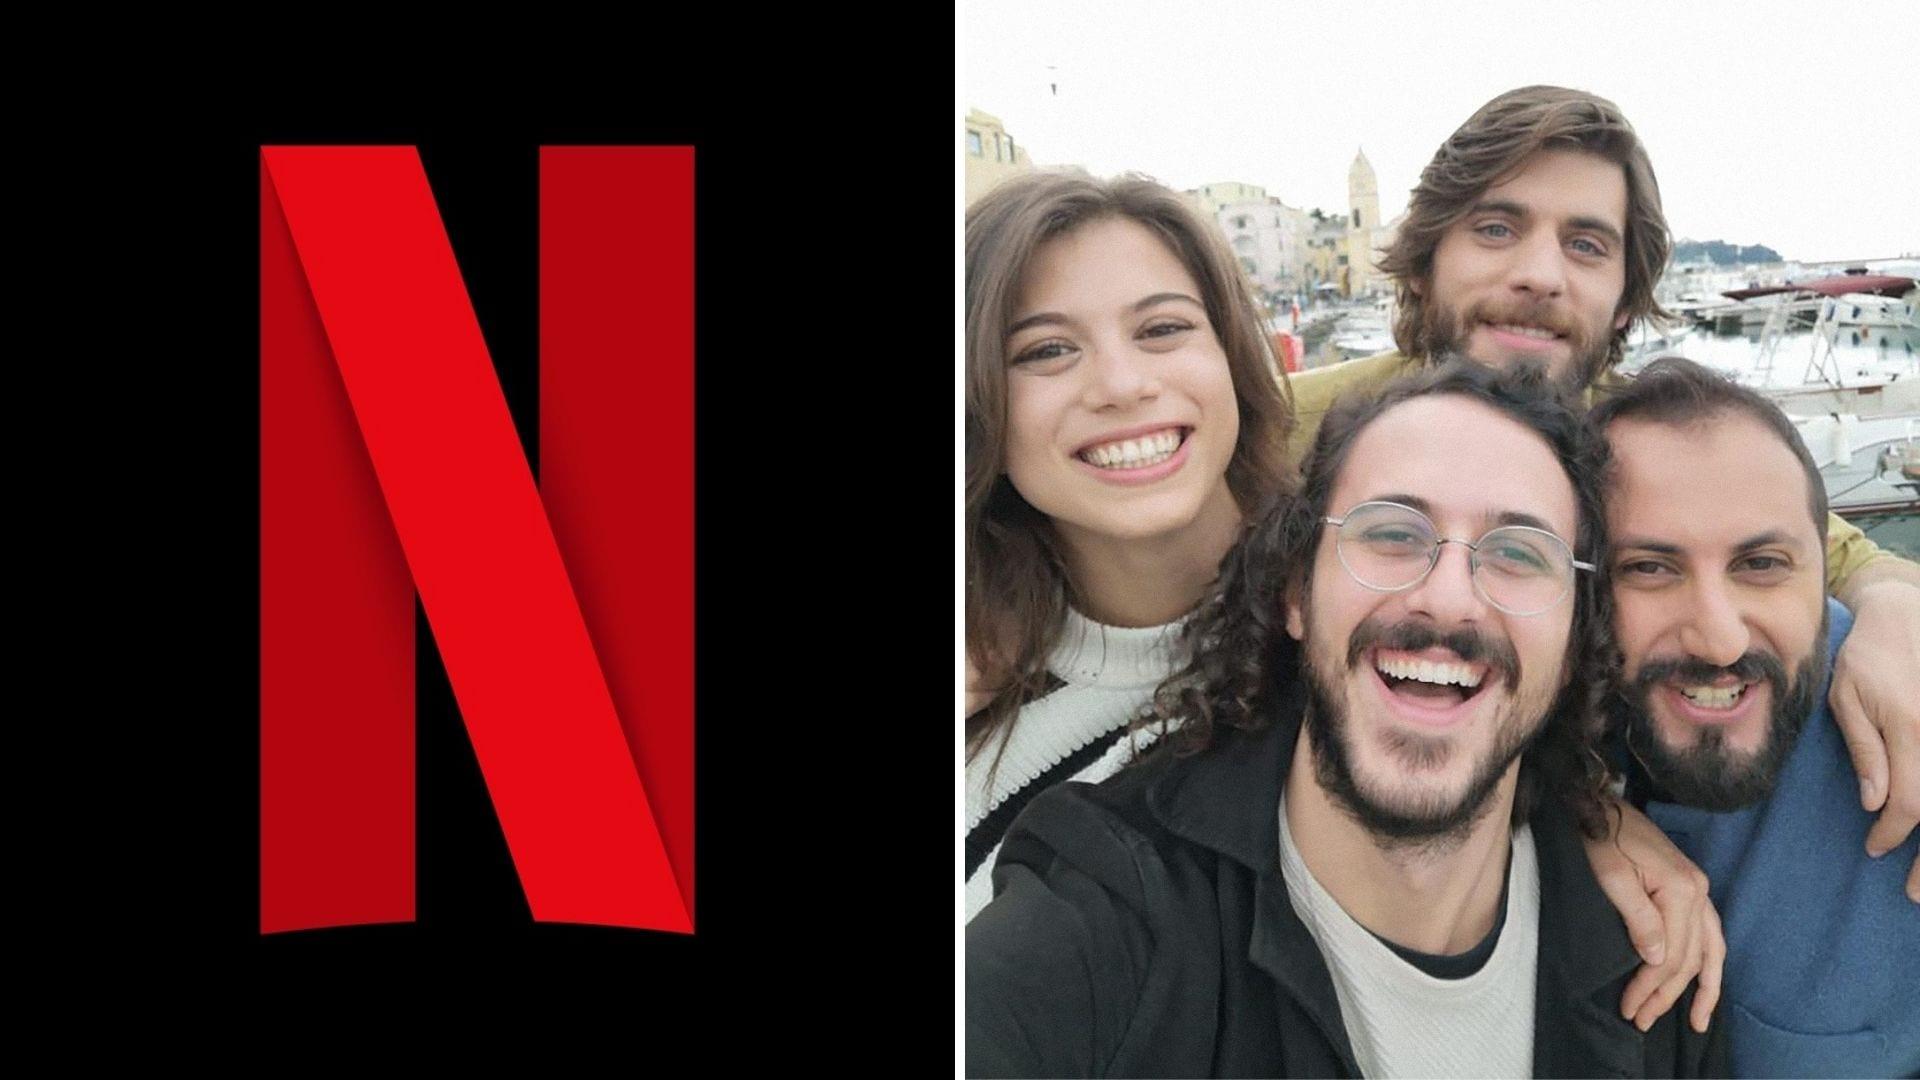 The Jackal: Netflix svilupperà una serie TV con gli Youtuber protagonisti